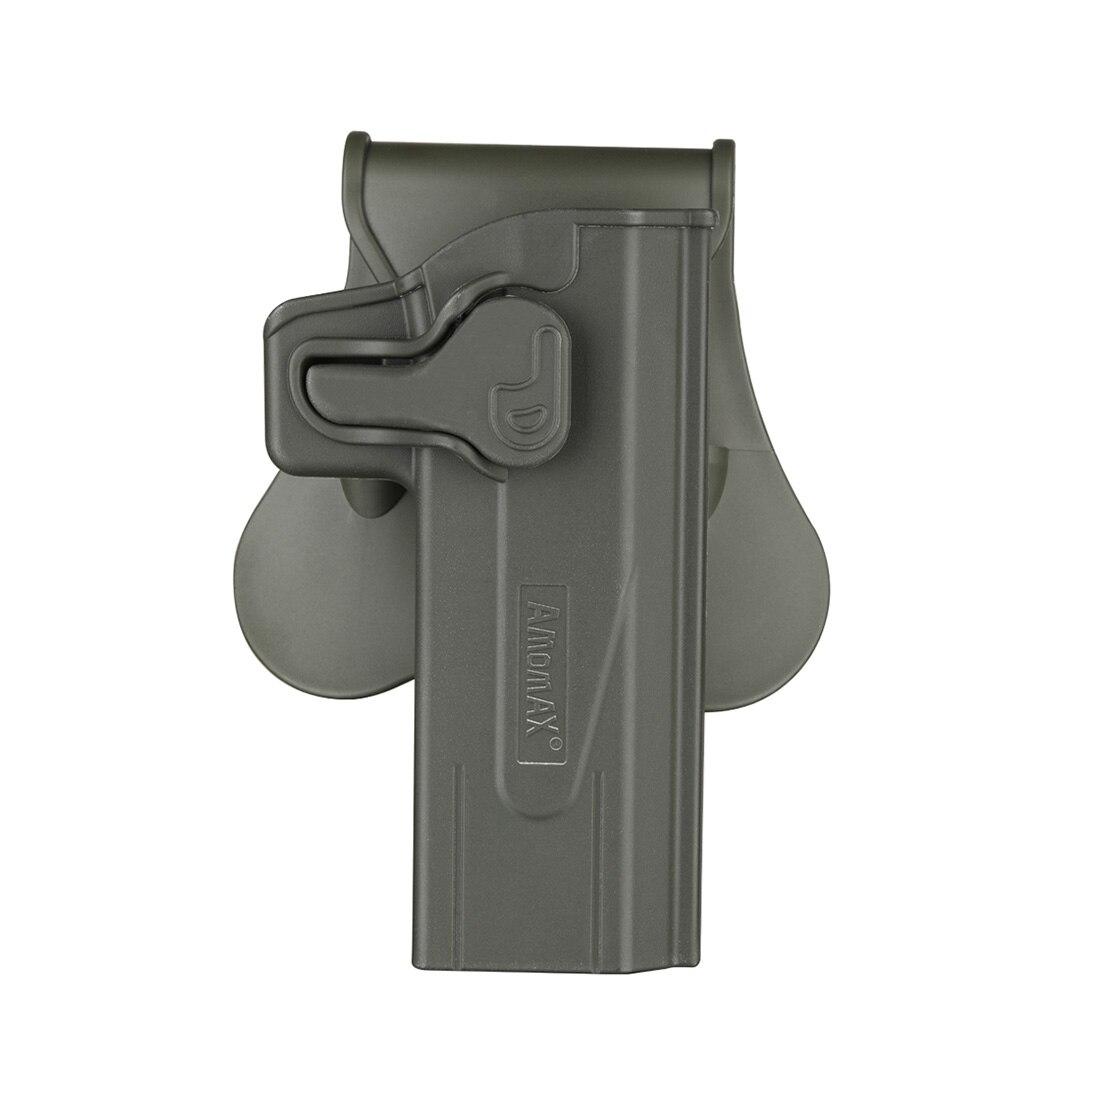 Amomax Adjustable Tactical Holster For STI Hi-capa 2011 Series Blaster/Tokyo Marui/WE/KWA/KJW/NOVRITSCH/SRC BABA YAGA-Right-hand